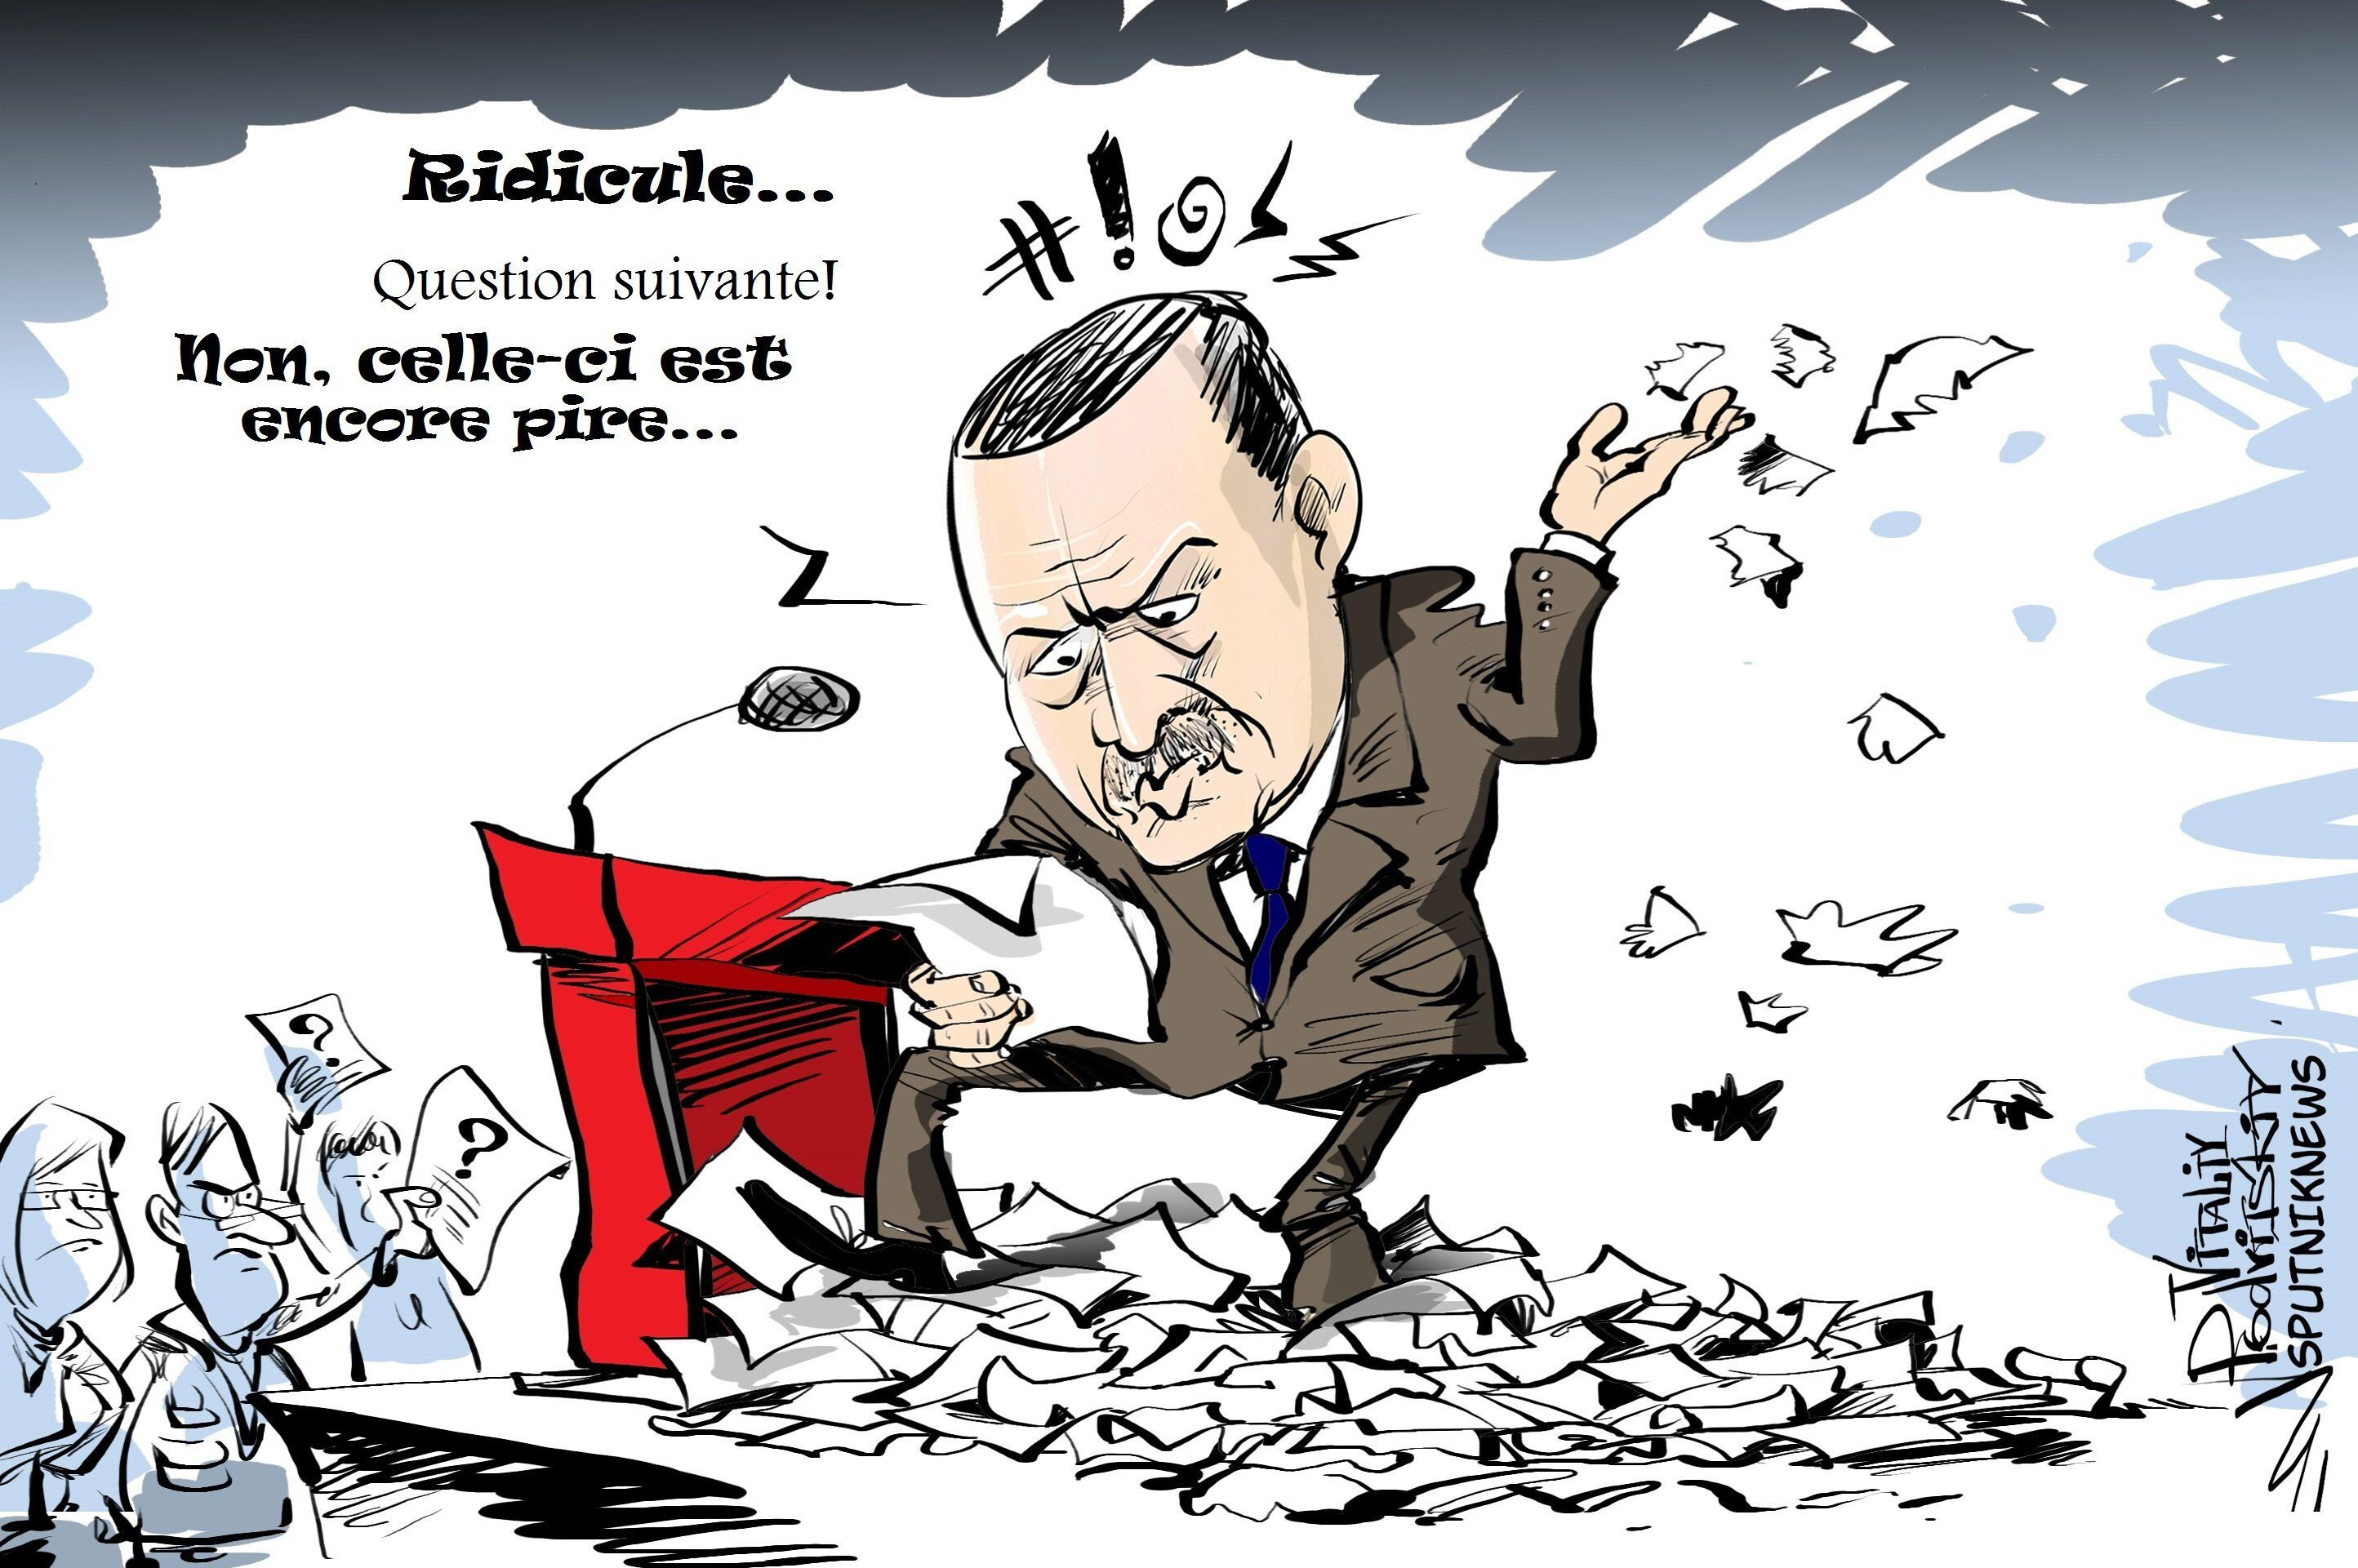 Turquie: un journaliste étranger? Dehors!